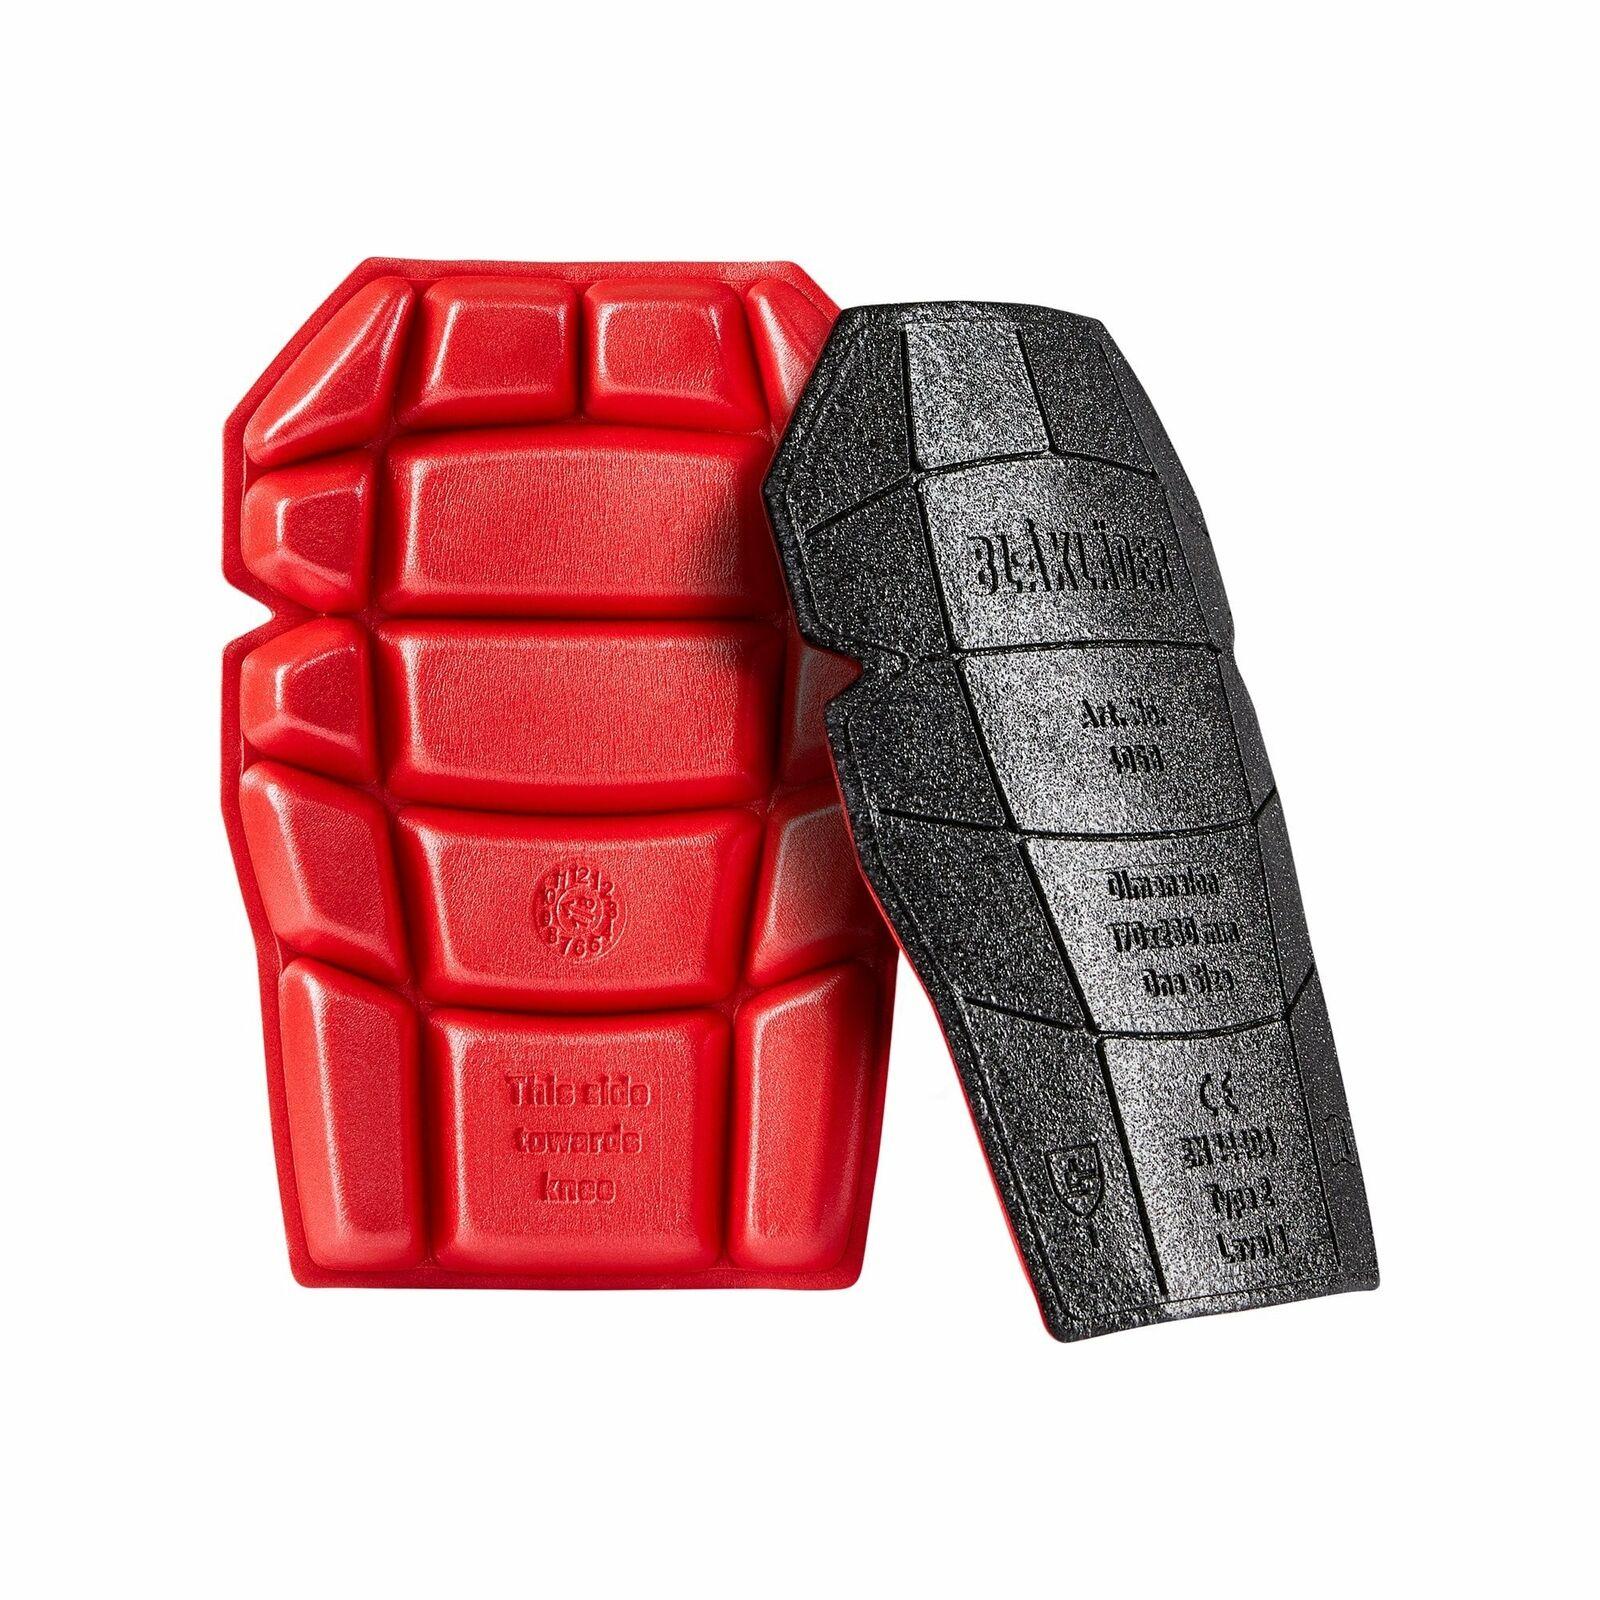 BLAKLADER Workwear | Knee Pads Heavy Duty | One Size